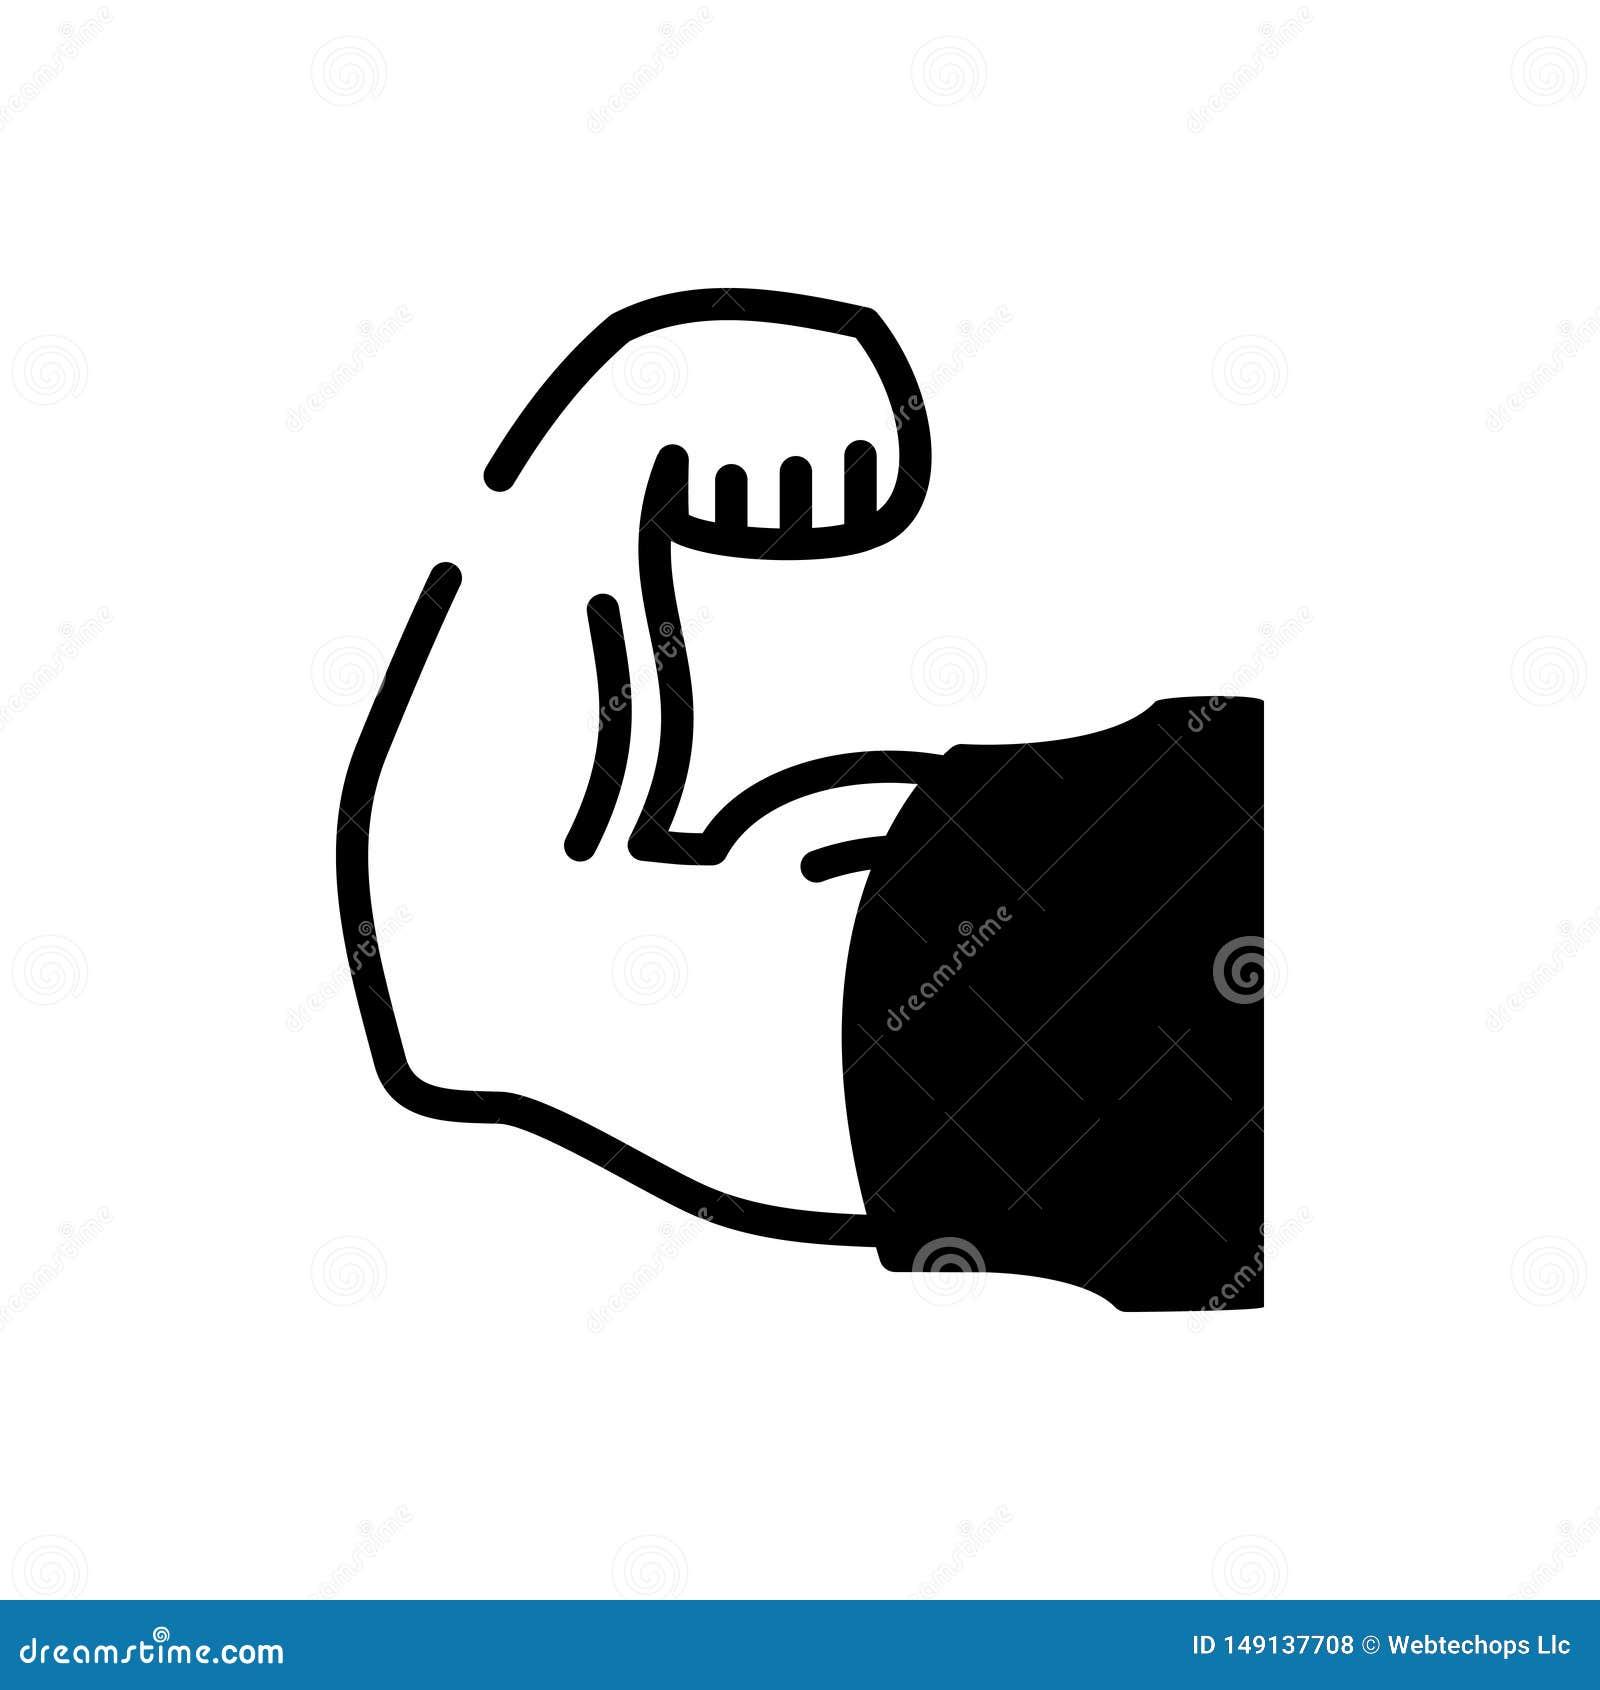 Zwart stevig pictogram voor Sterk, stevig en robuust